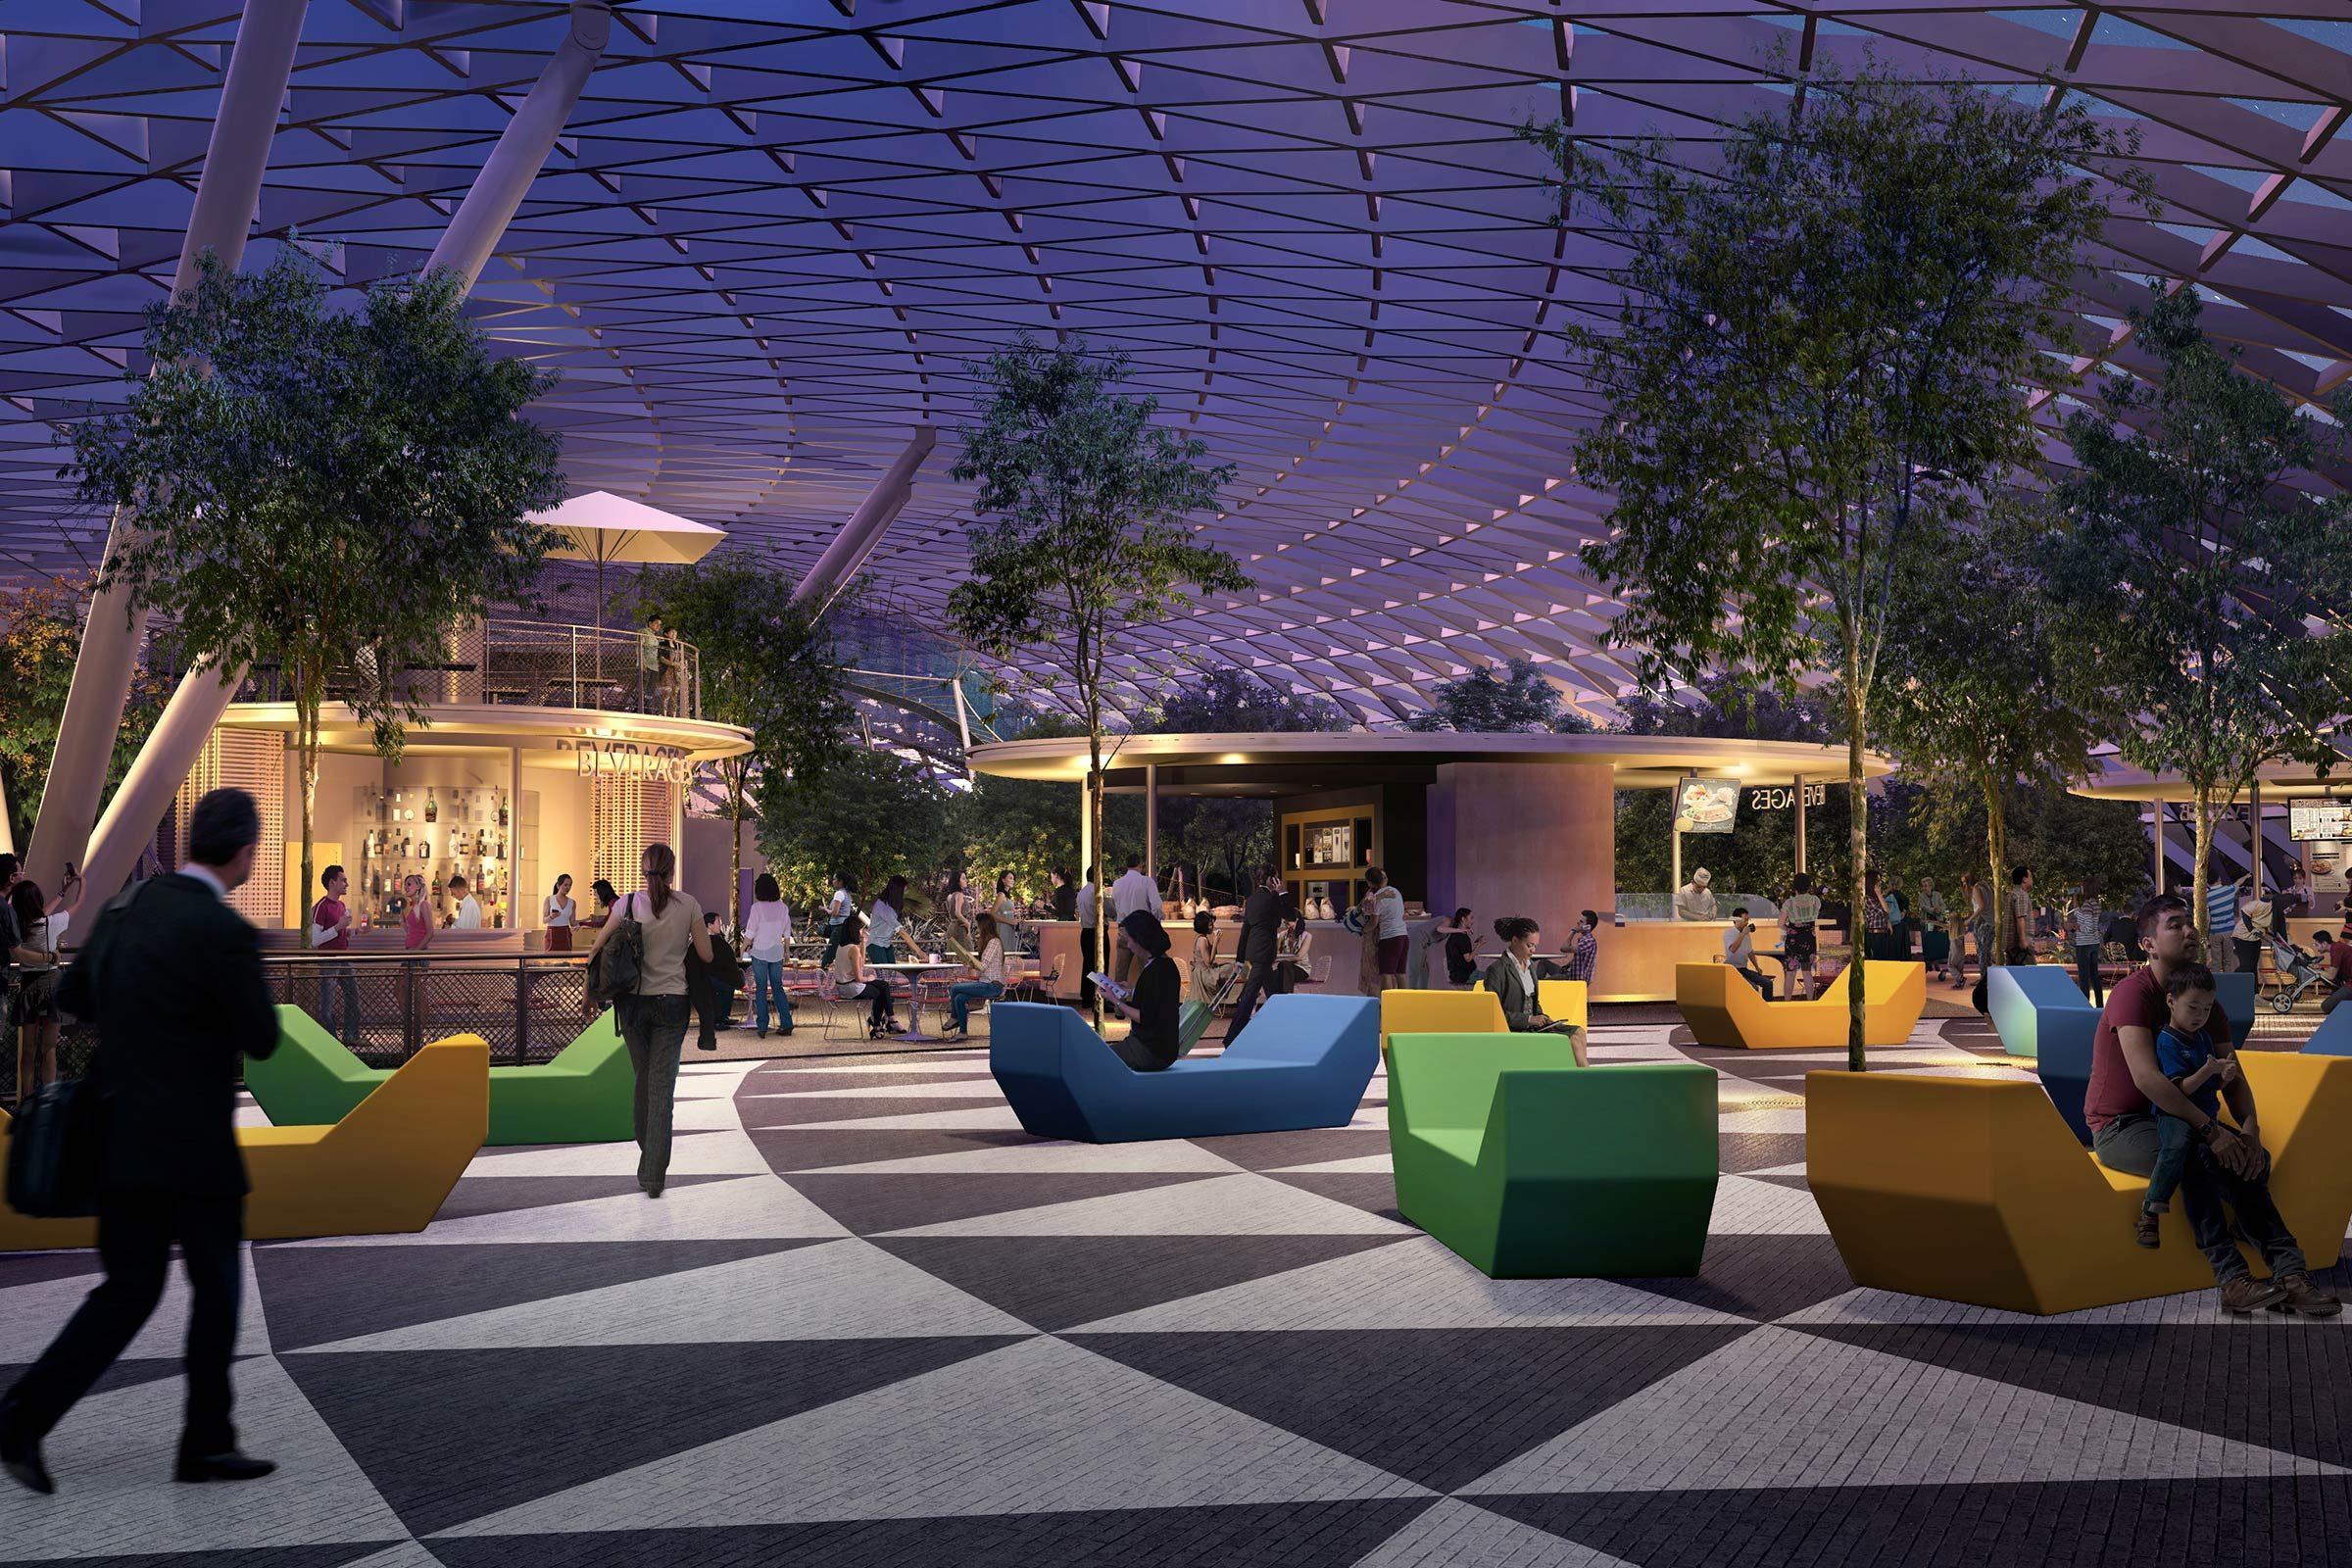 L'aéroport Changi : Le Bijou